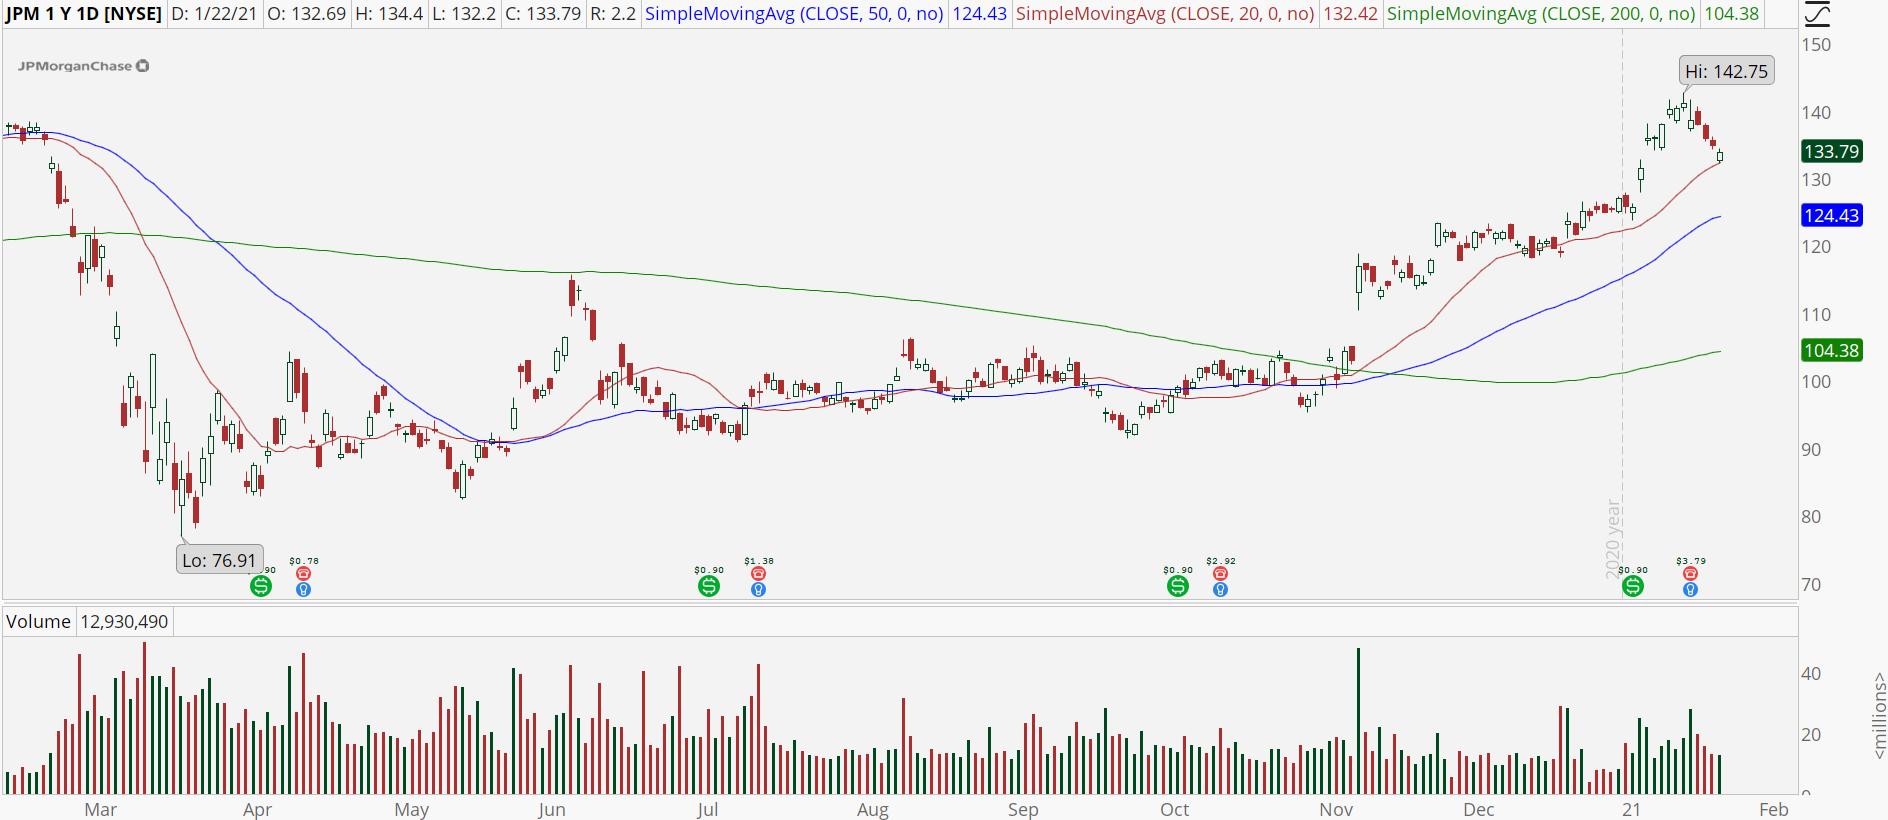 JPMorgan (JPM) stock with bull retracement pattern